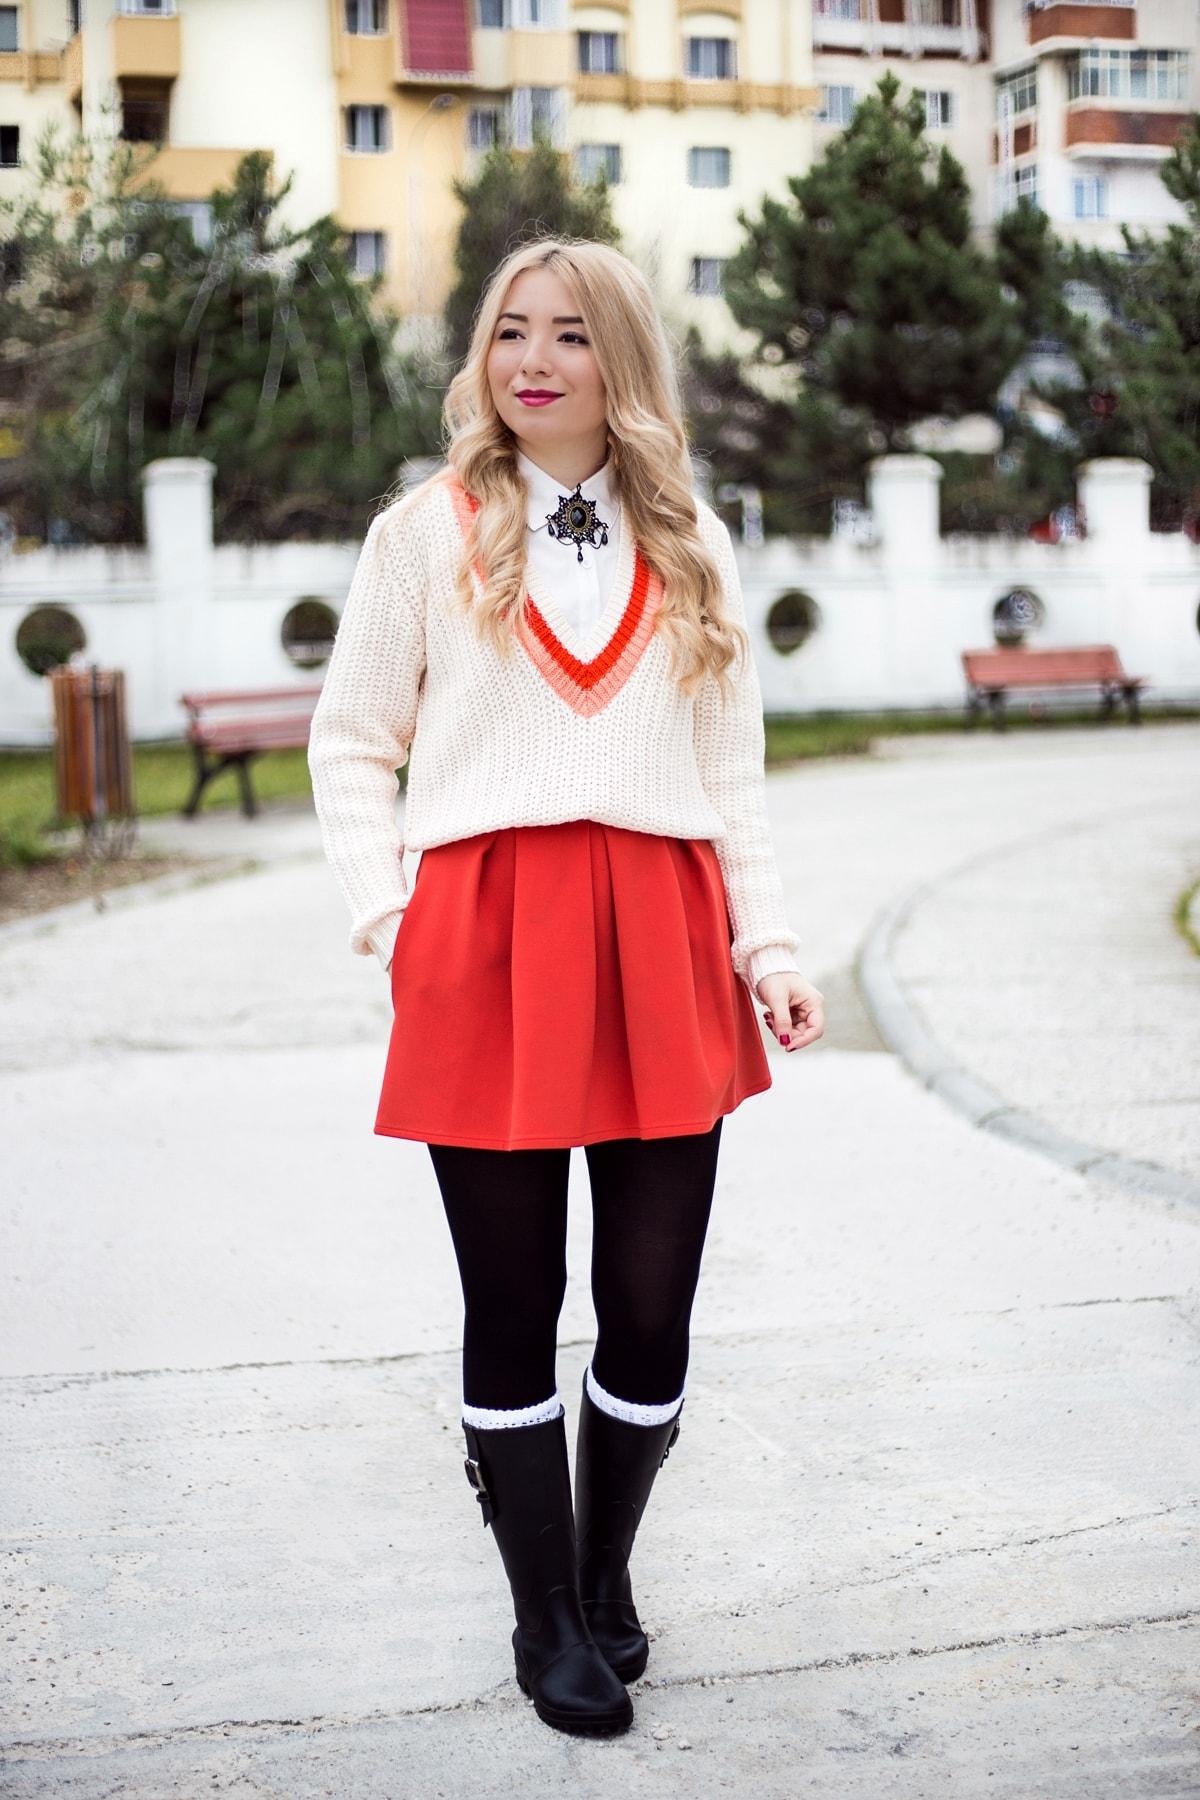 Tinuta de toamna, fusta cu pliuri rosie andreea design, pulover cu camasa, pulover preppy, cizme cauciuc negre, street style, fashion, moda, andreea ristea blog